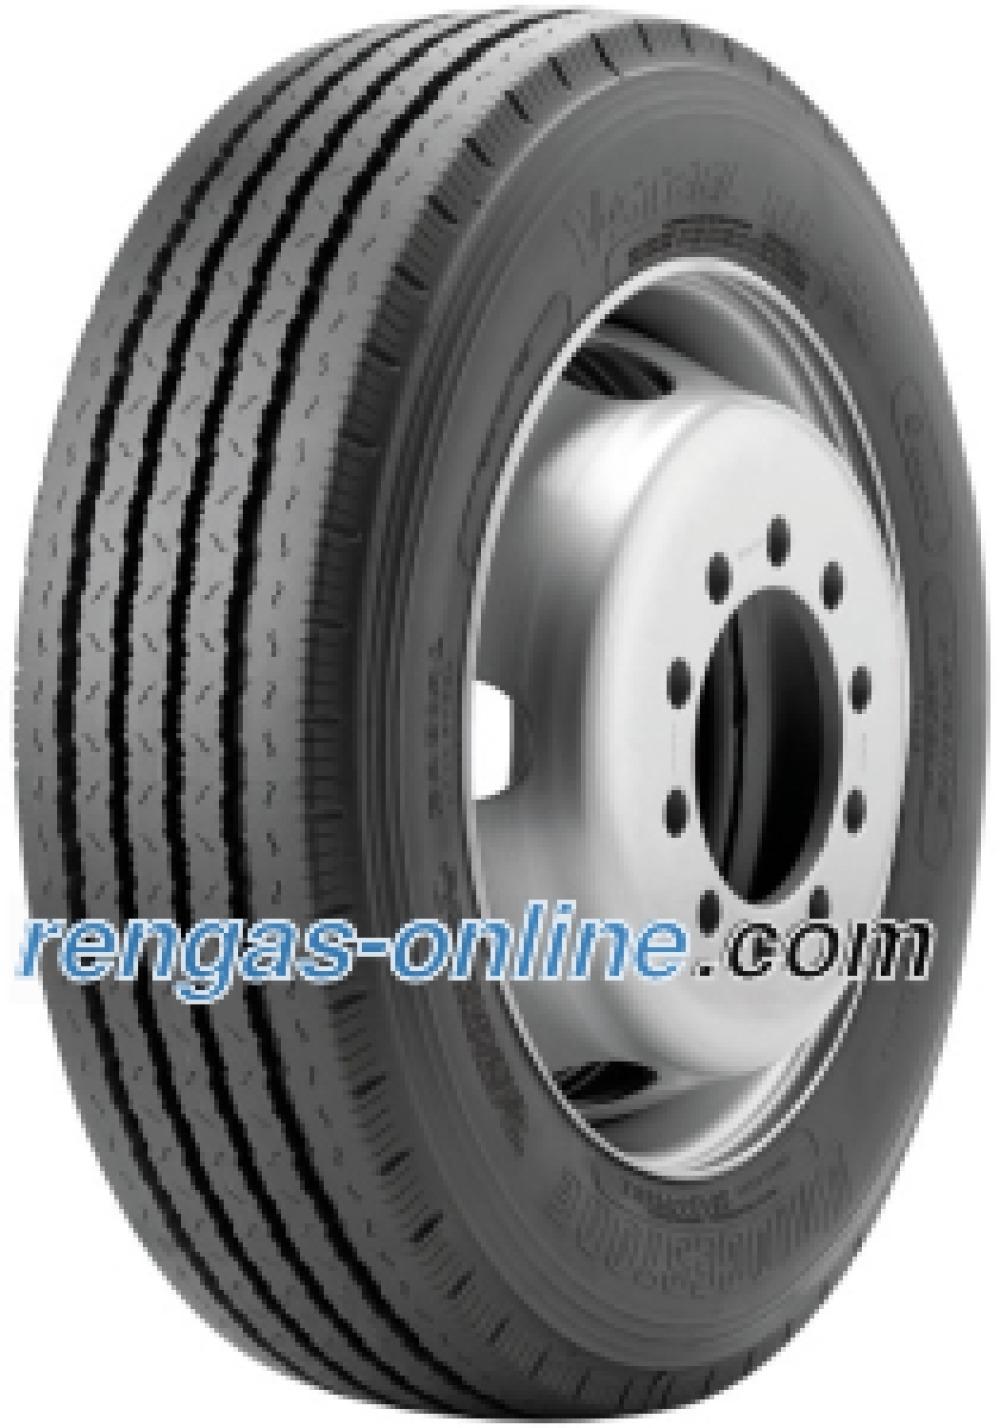 bridgestone-r-294-25570-r225-140137m